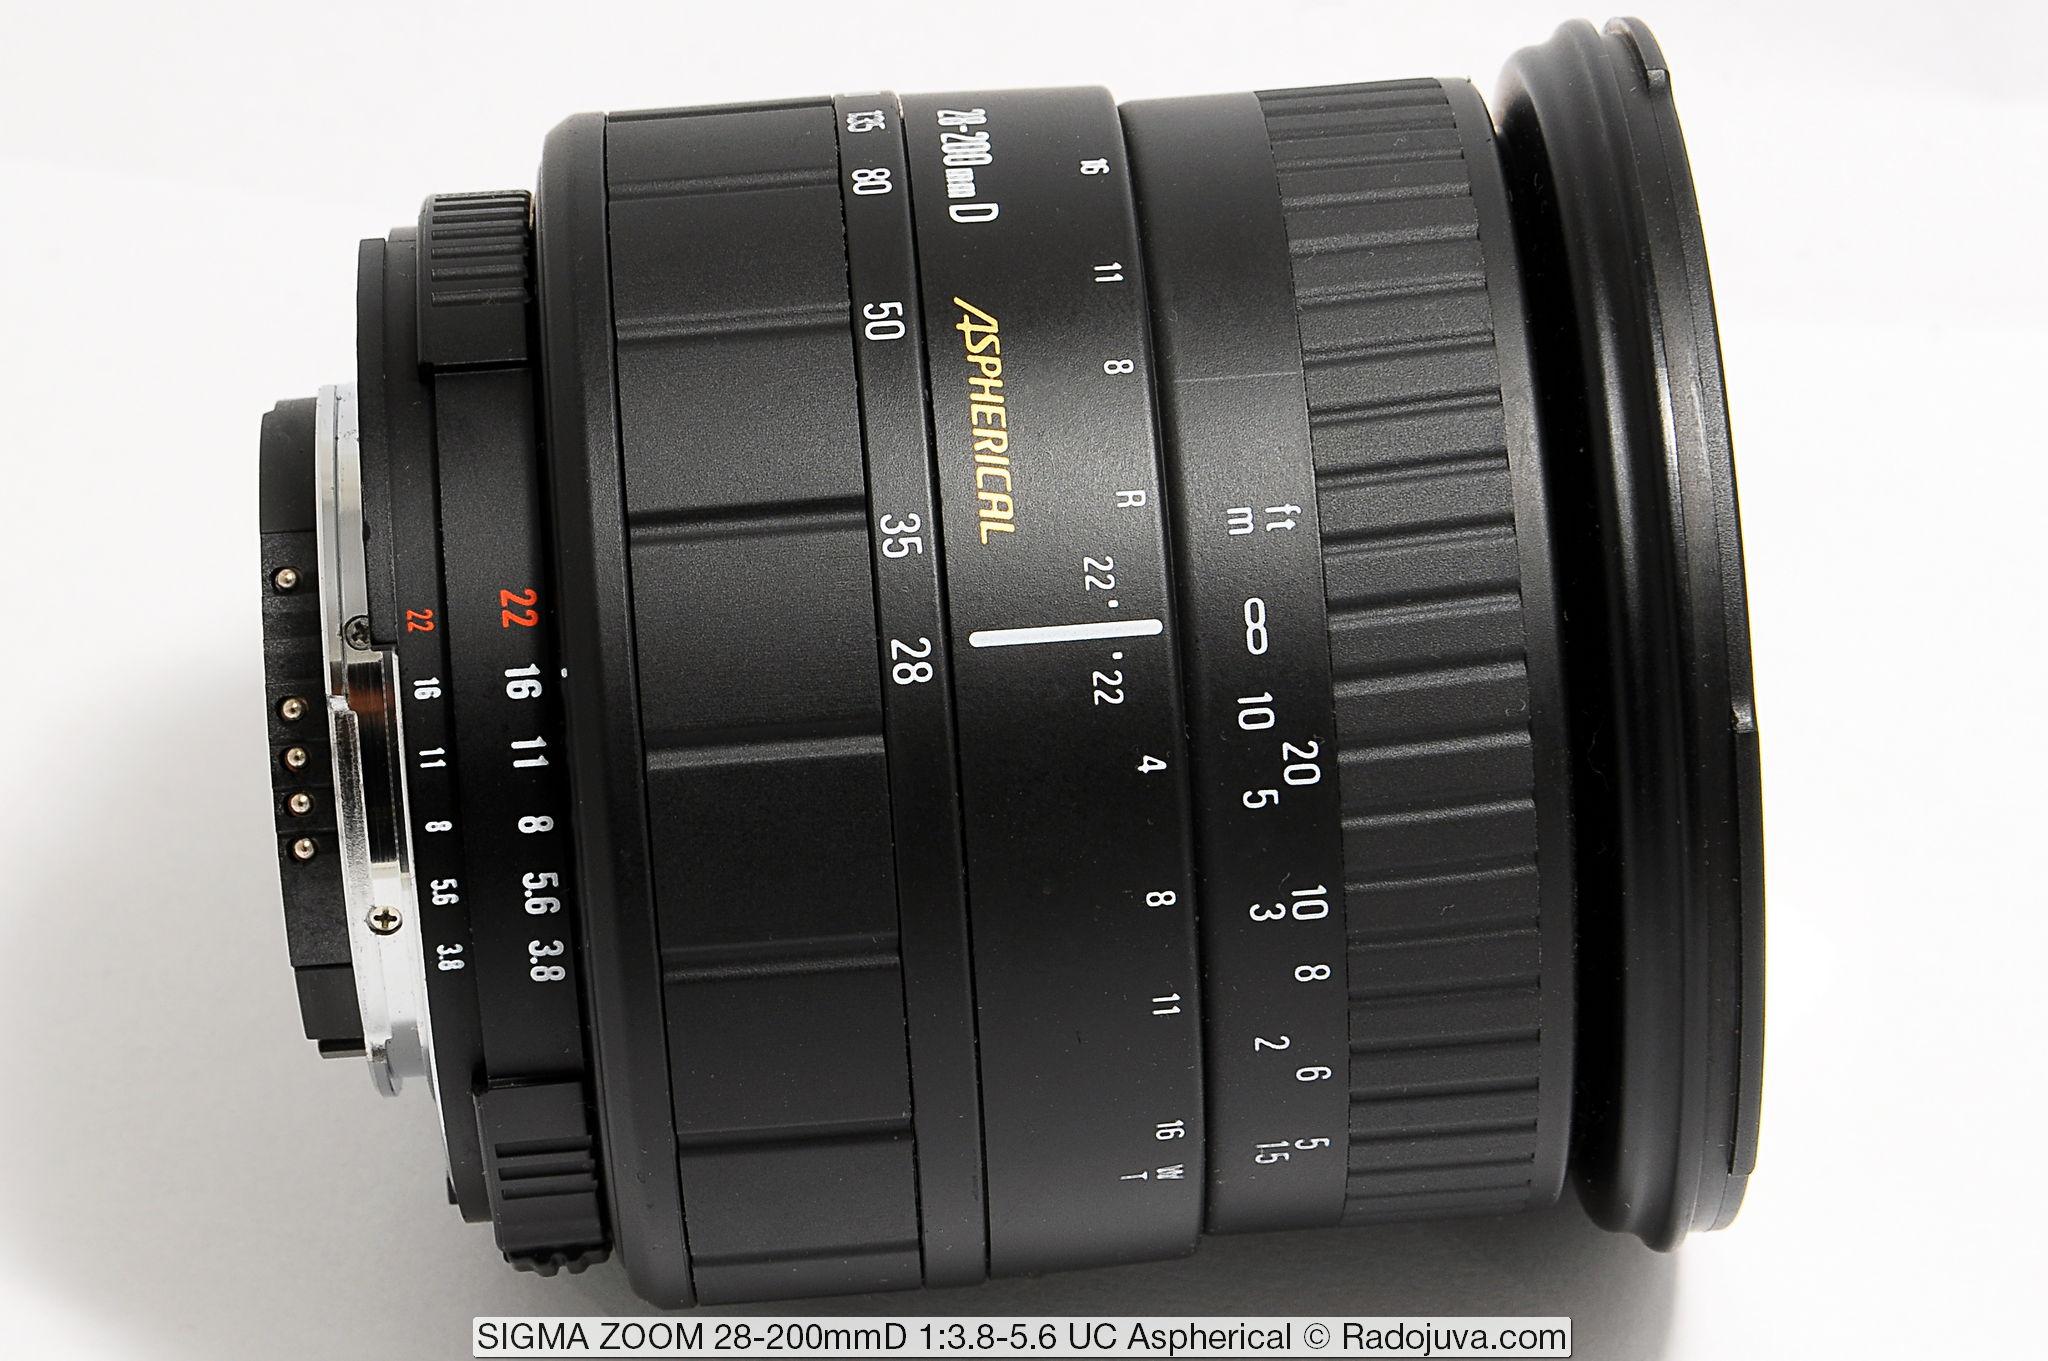 SIGMA ZOOM 28-200mmD 1:3.8-5.6 UC Aspherical